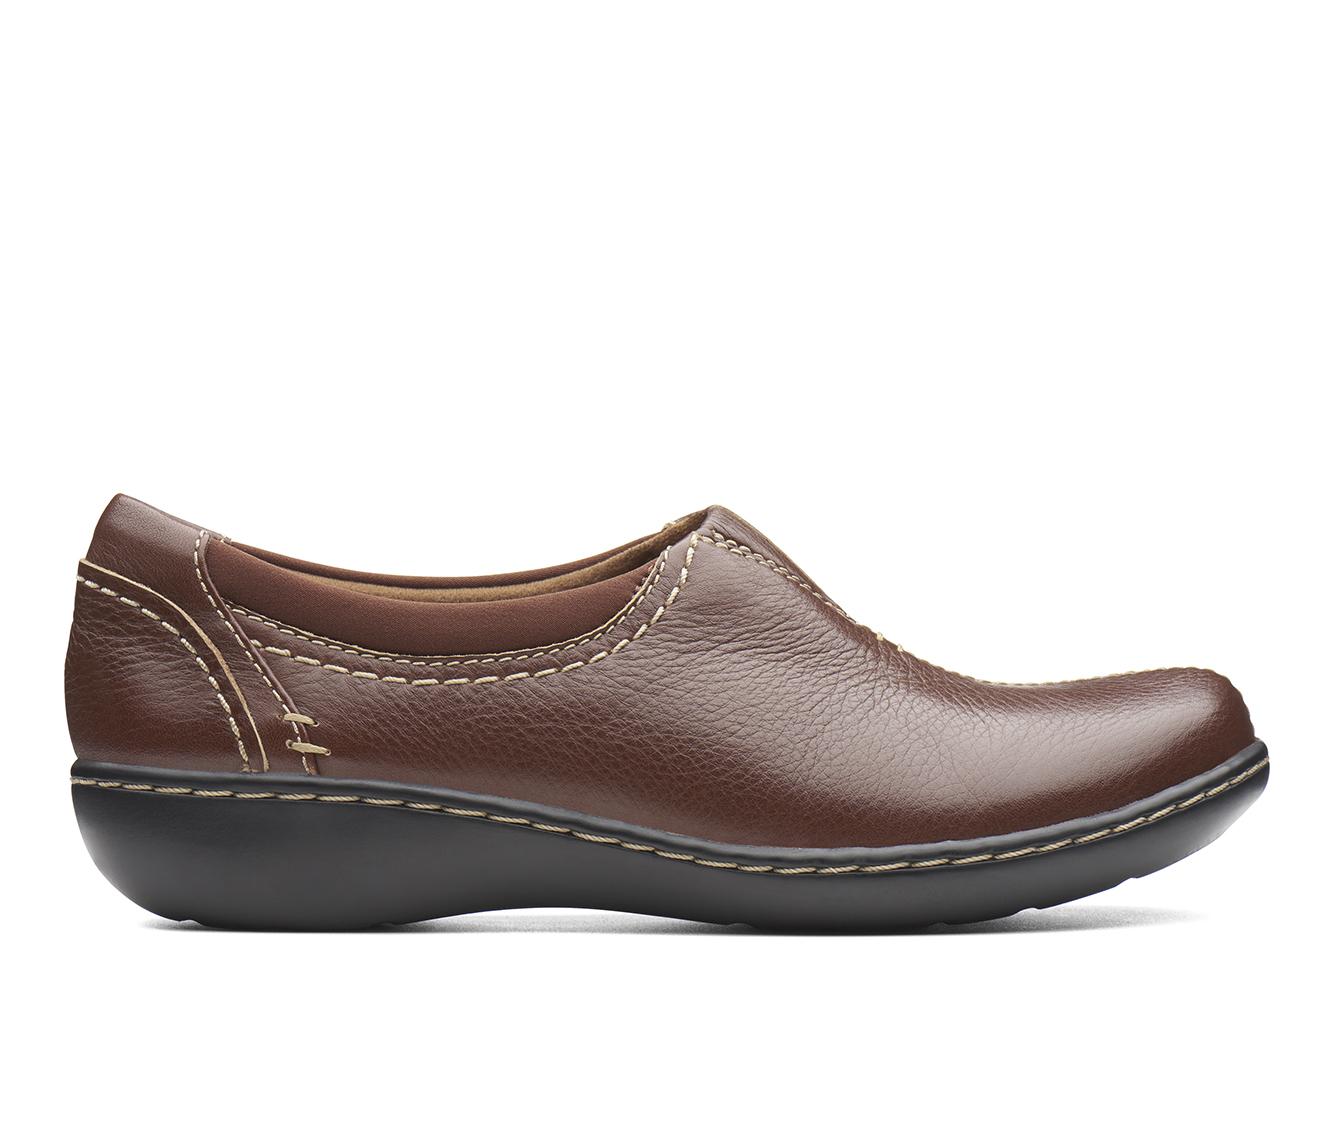 Clarks Ashland Joy Women's Shoe (Brown Leather)